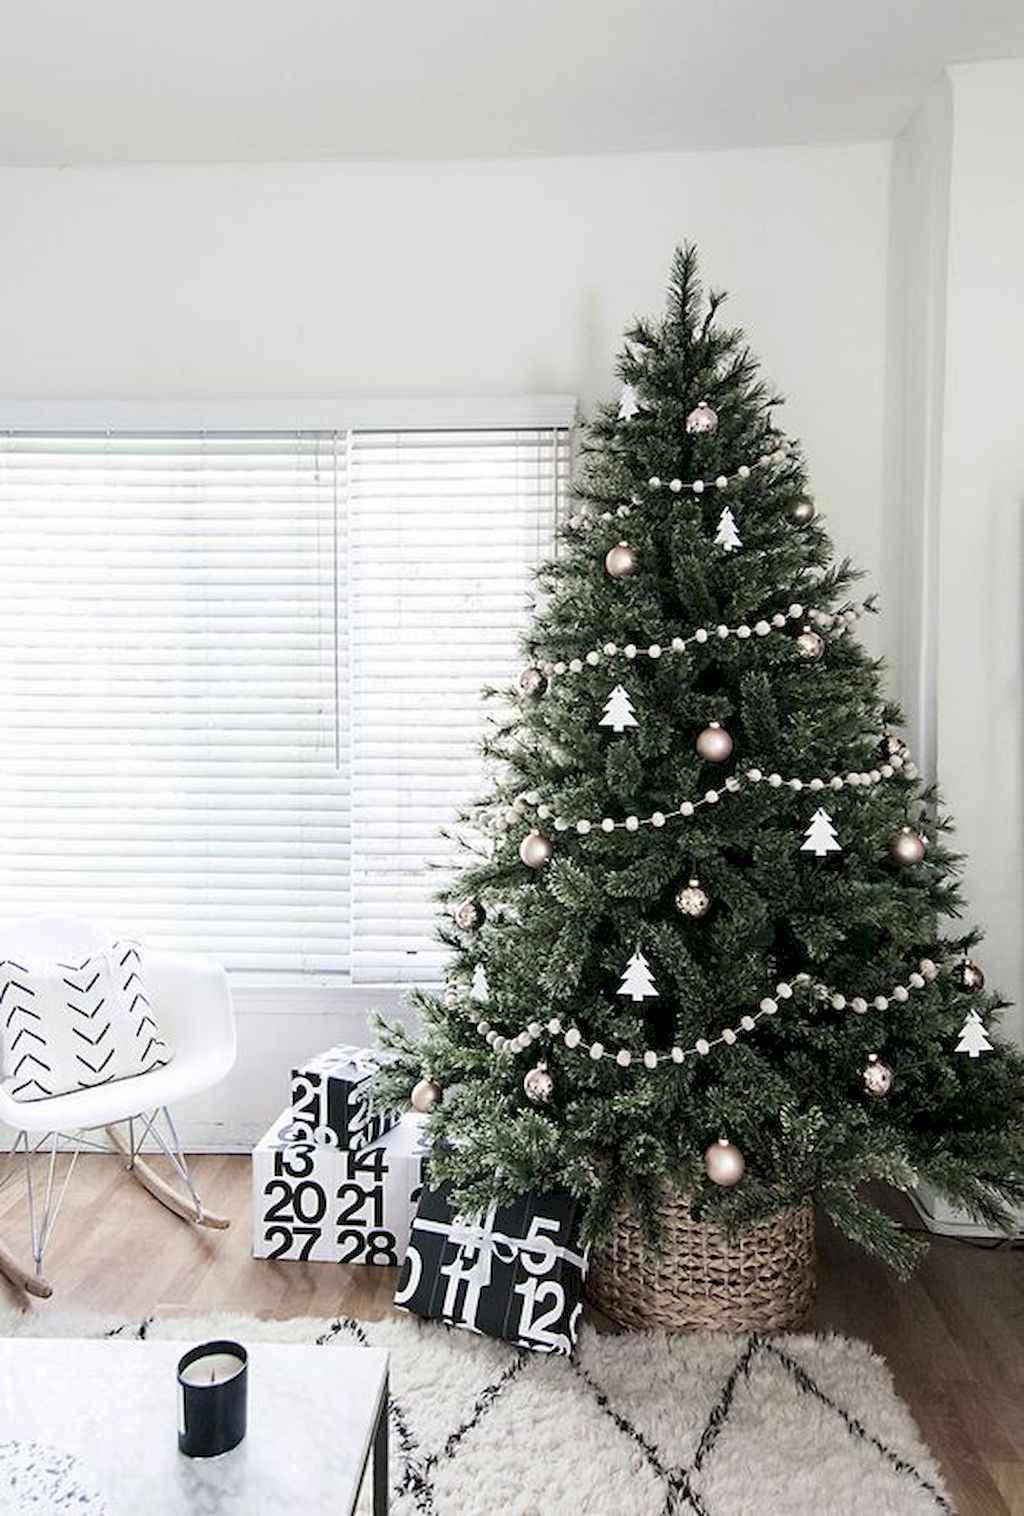 100 beautiful christmas tree decorations ideas (60) - Roomadness.com